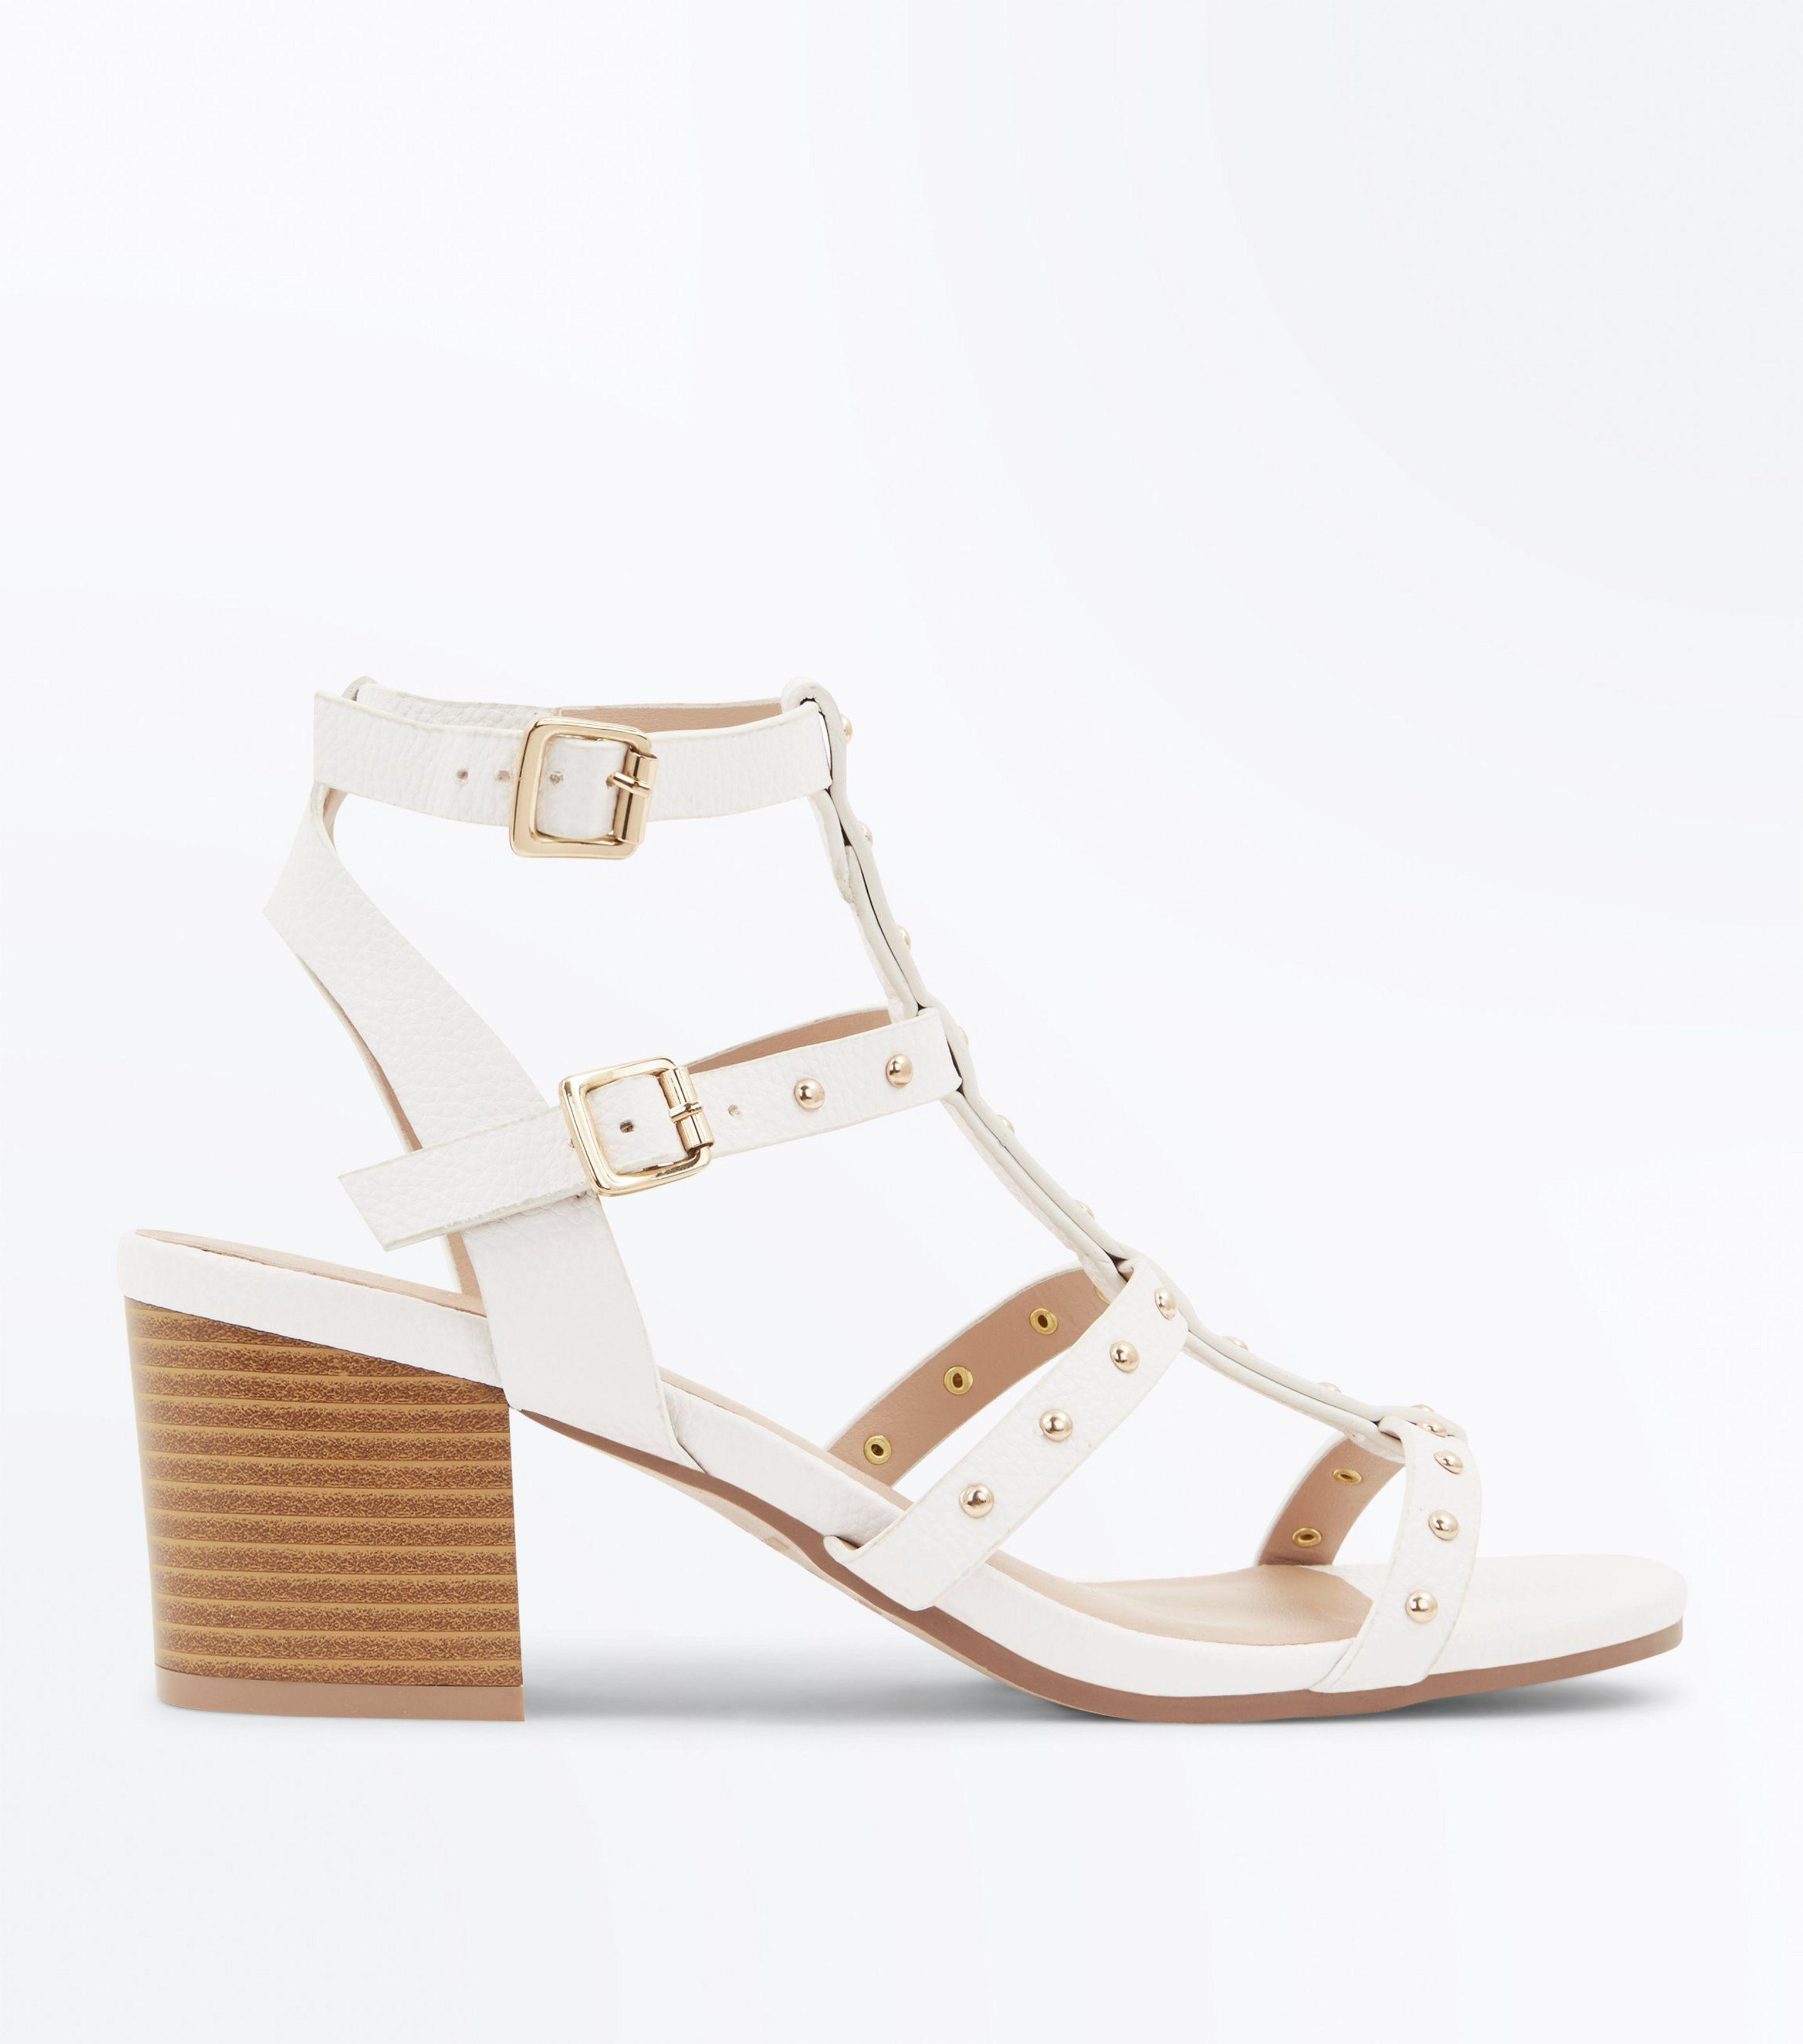 5ae96e0c3d3 New Look White Studded Block Heel Gladiator Sandals in White - Lyst